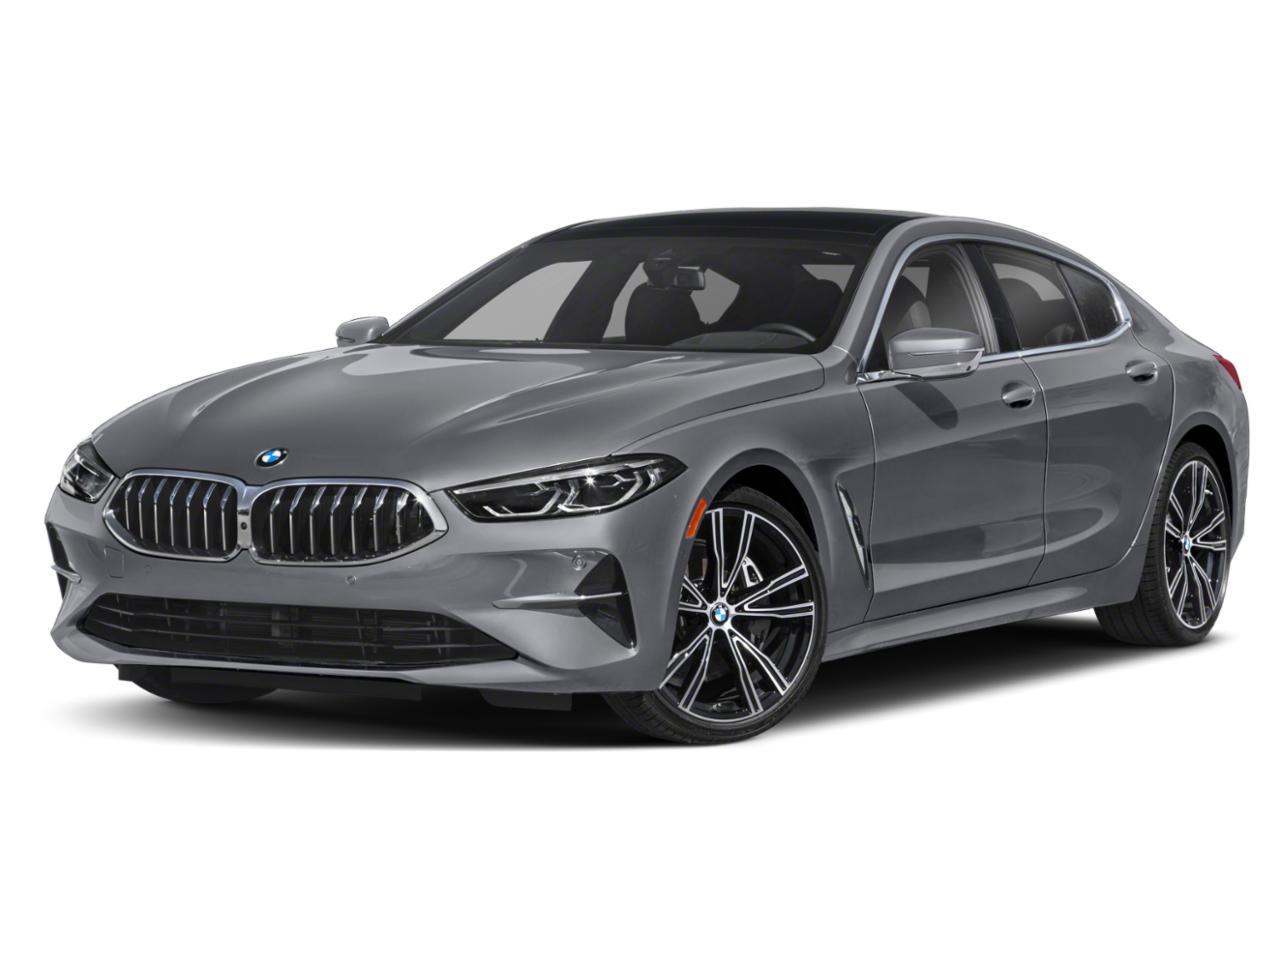 2022 BMW 840i Vehicle Photo in Grapevine, TX 76051